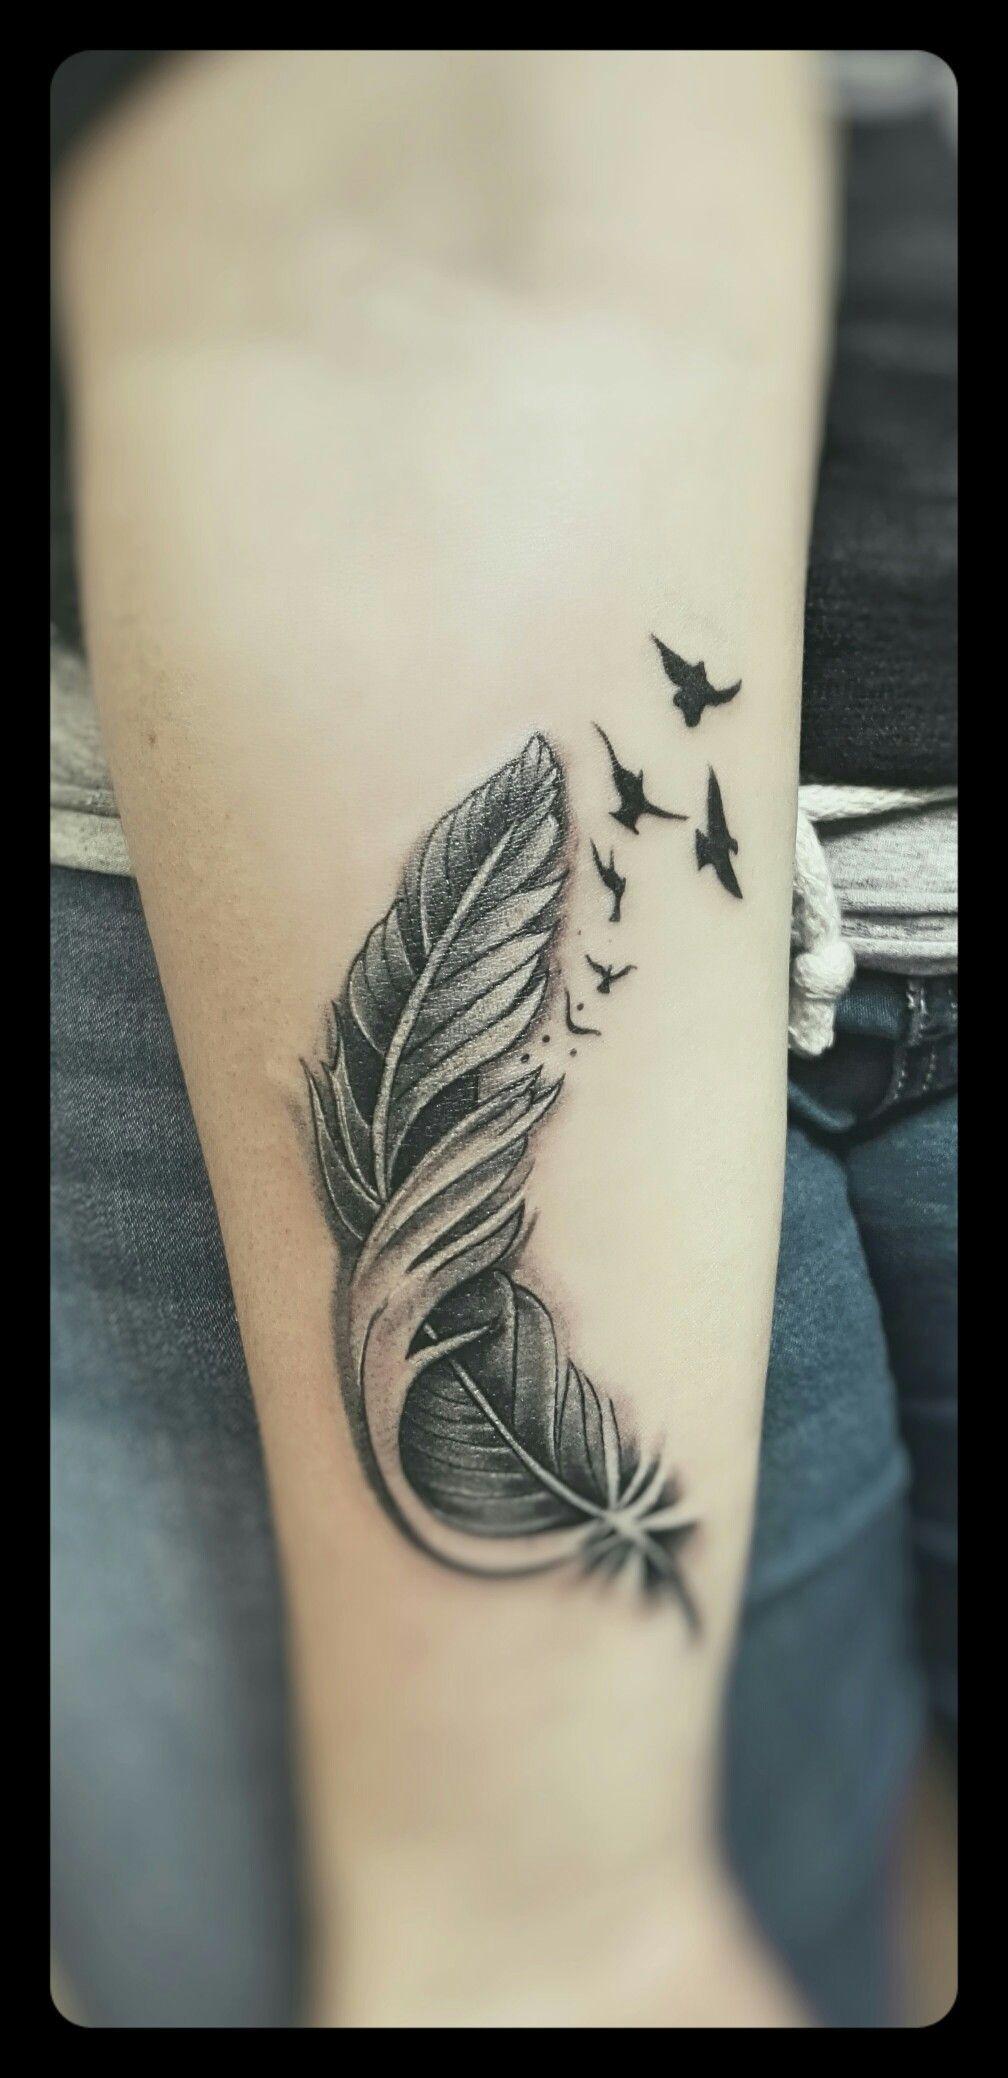 pin by liane siemers on tattooed pinterest tattoo tatoo and tatoos. Black Bedroom Furniture Sets. Home Design Ideas